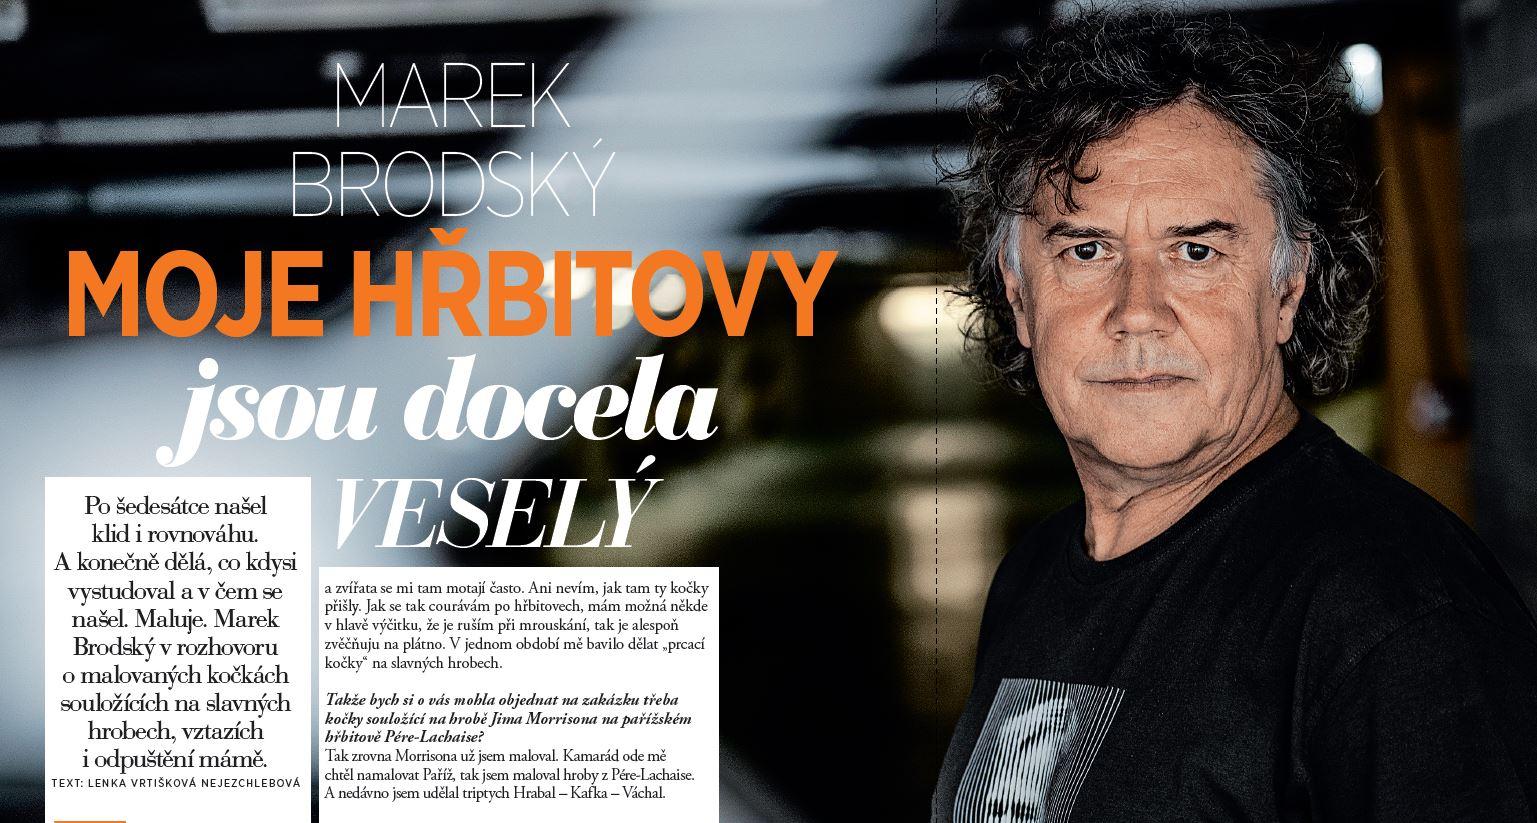 Marek Brodský